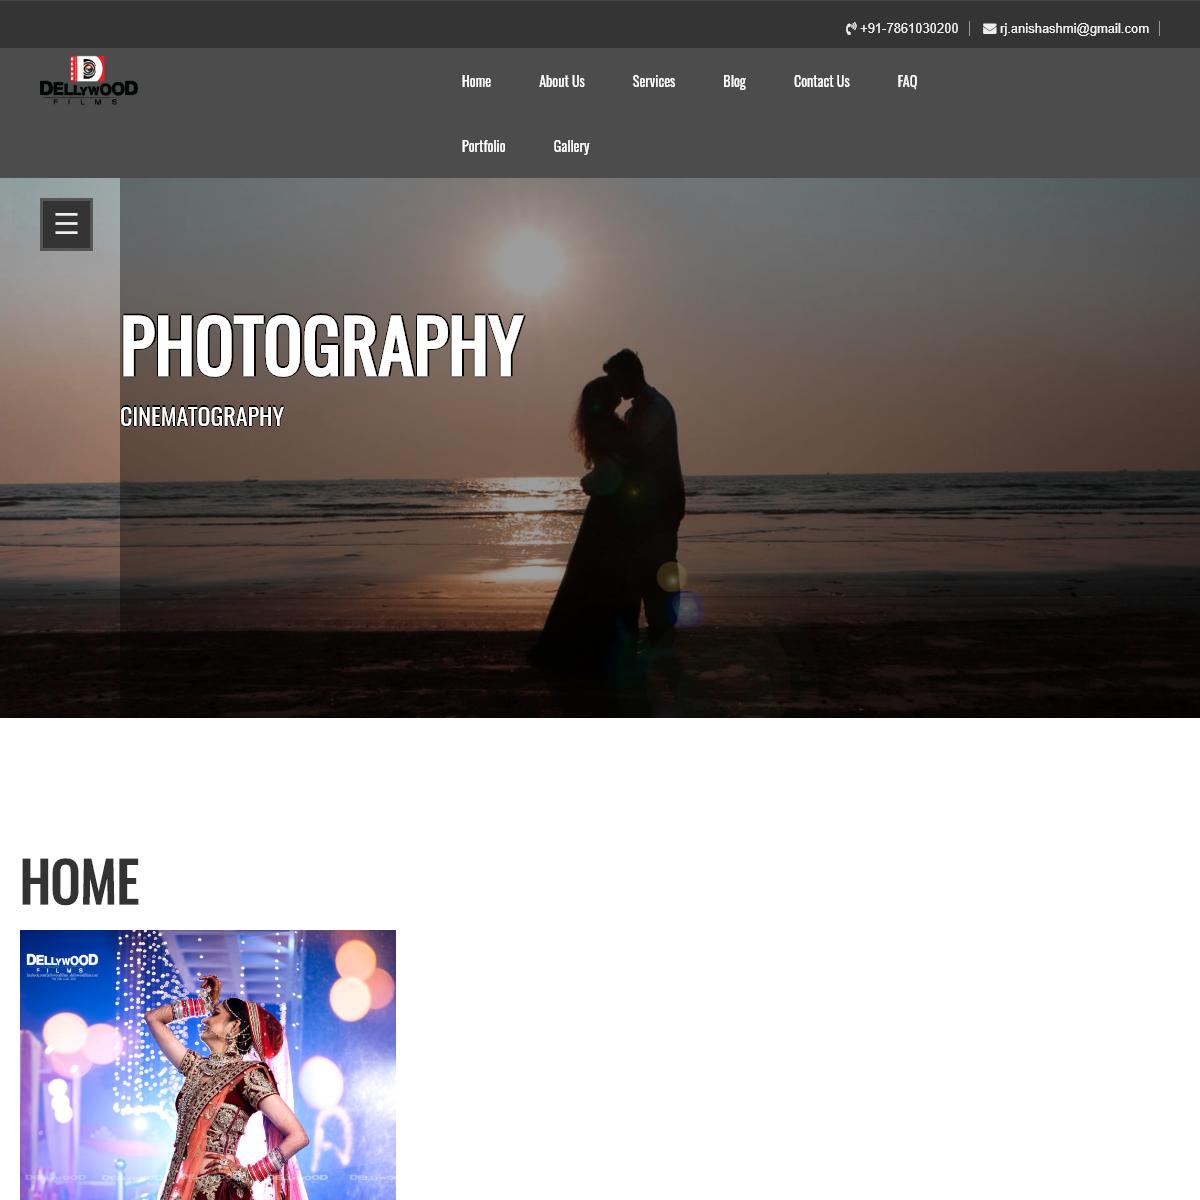 photography – Cinematography